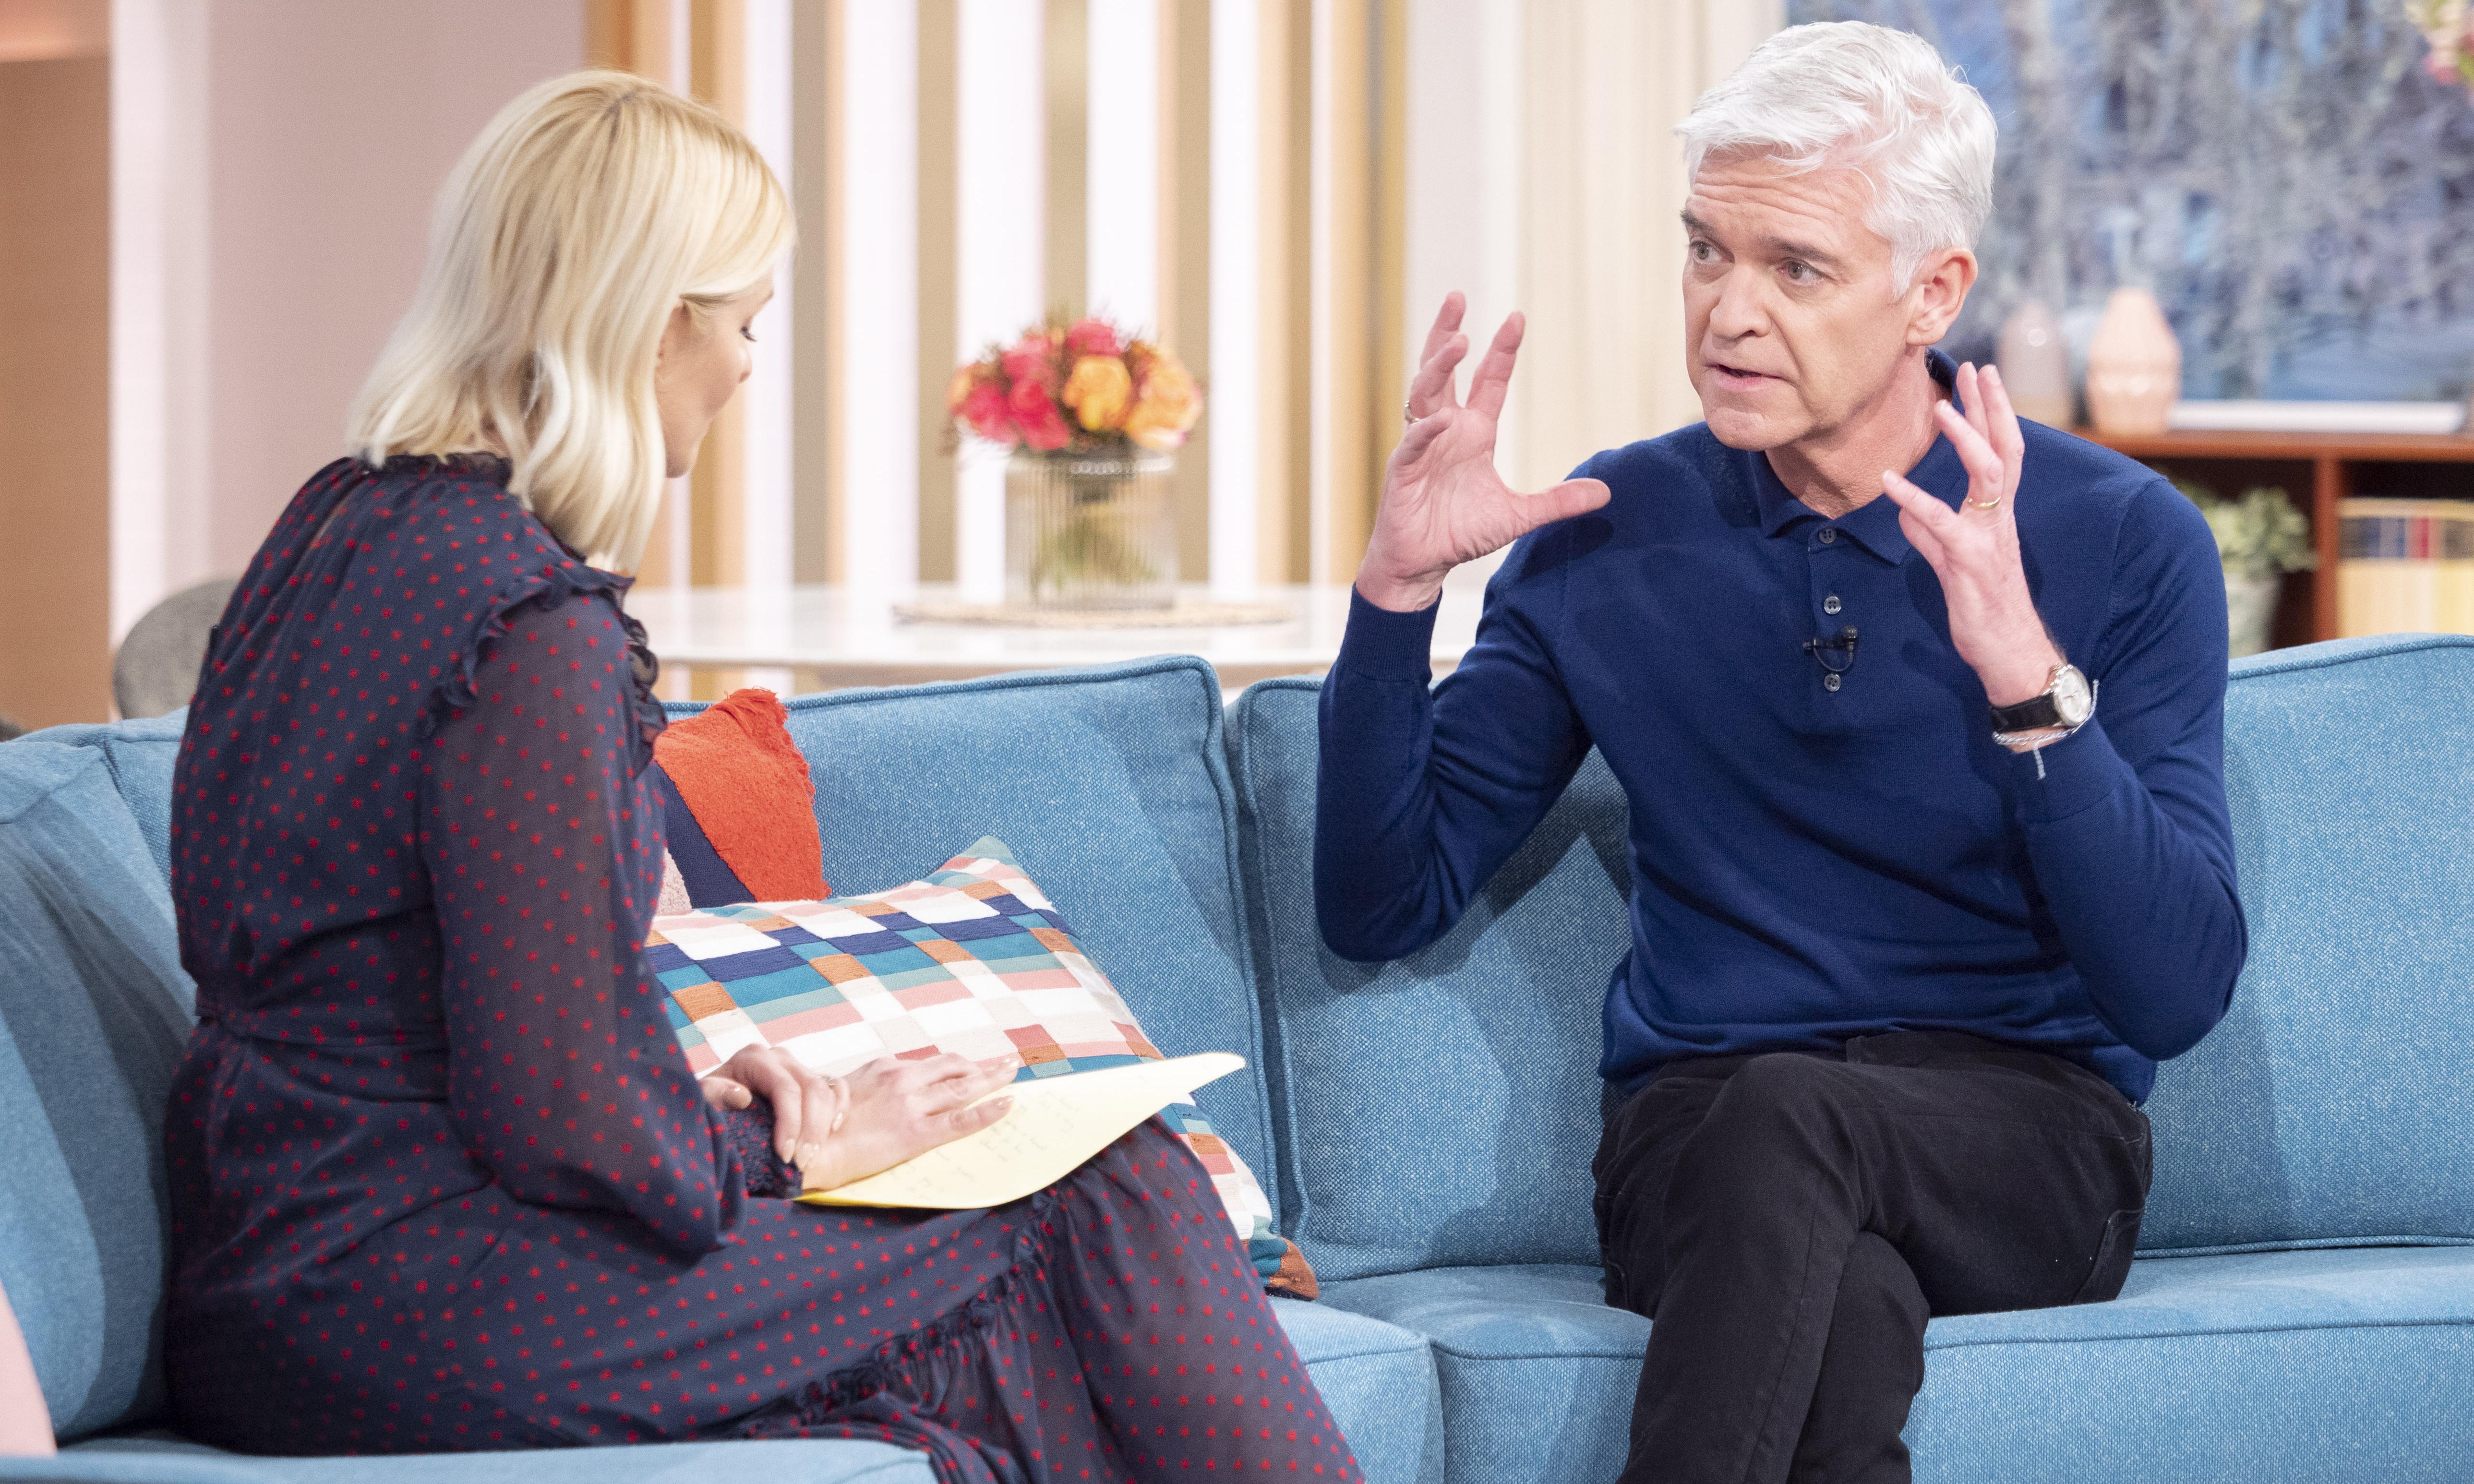 Phillip Schofield, ITV presenter, announces he is gay